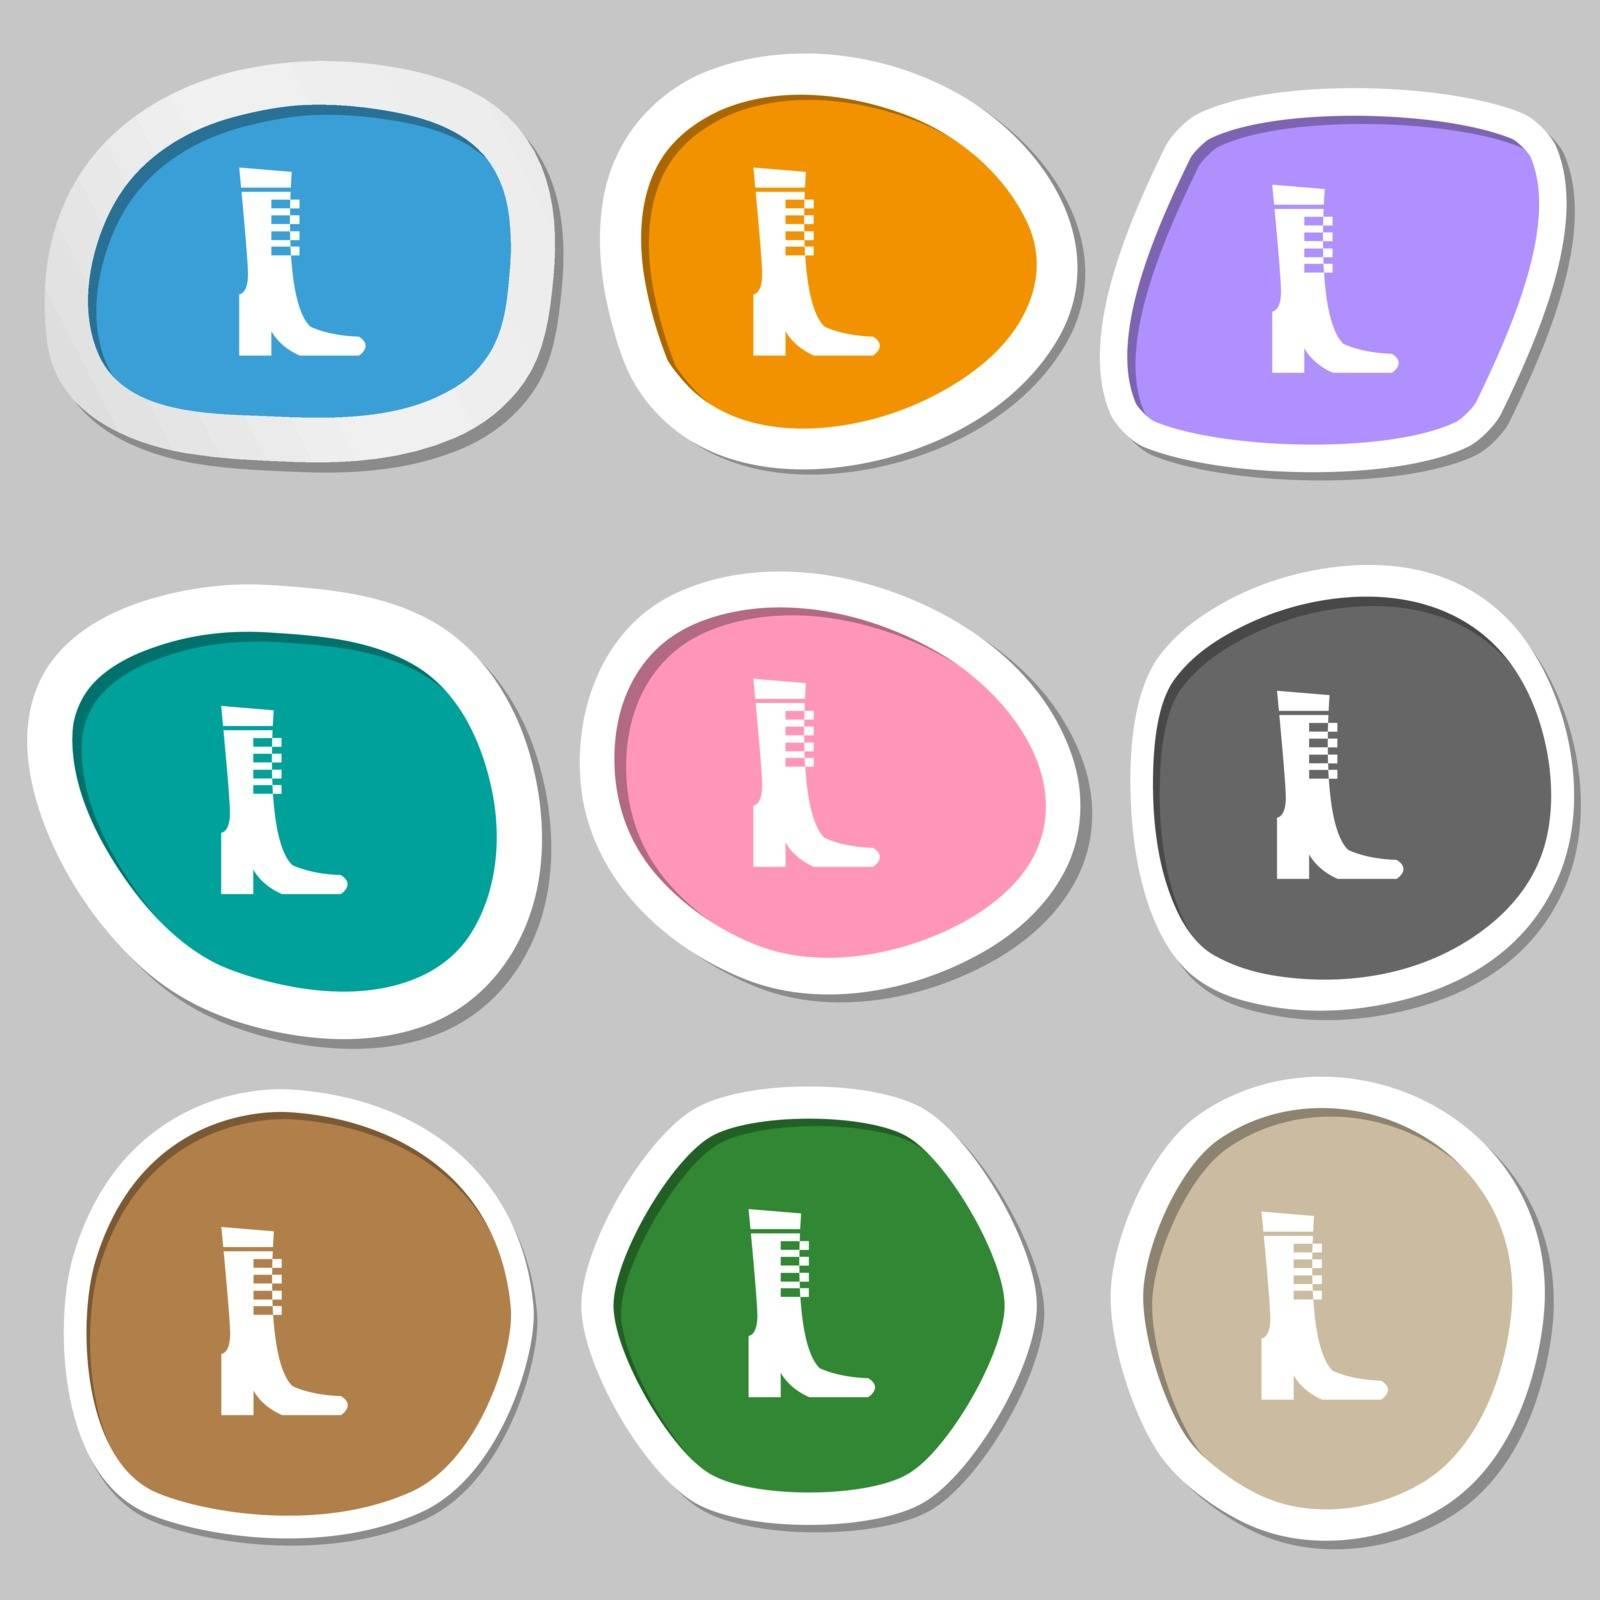 female fall and winter shoe, boot icon symbols. Multicolored paper stickers. Vector illustration